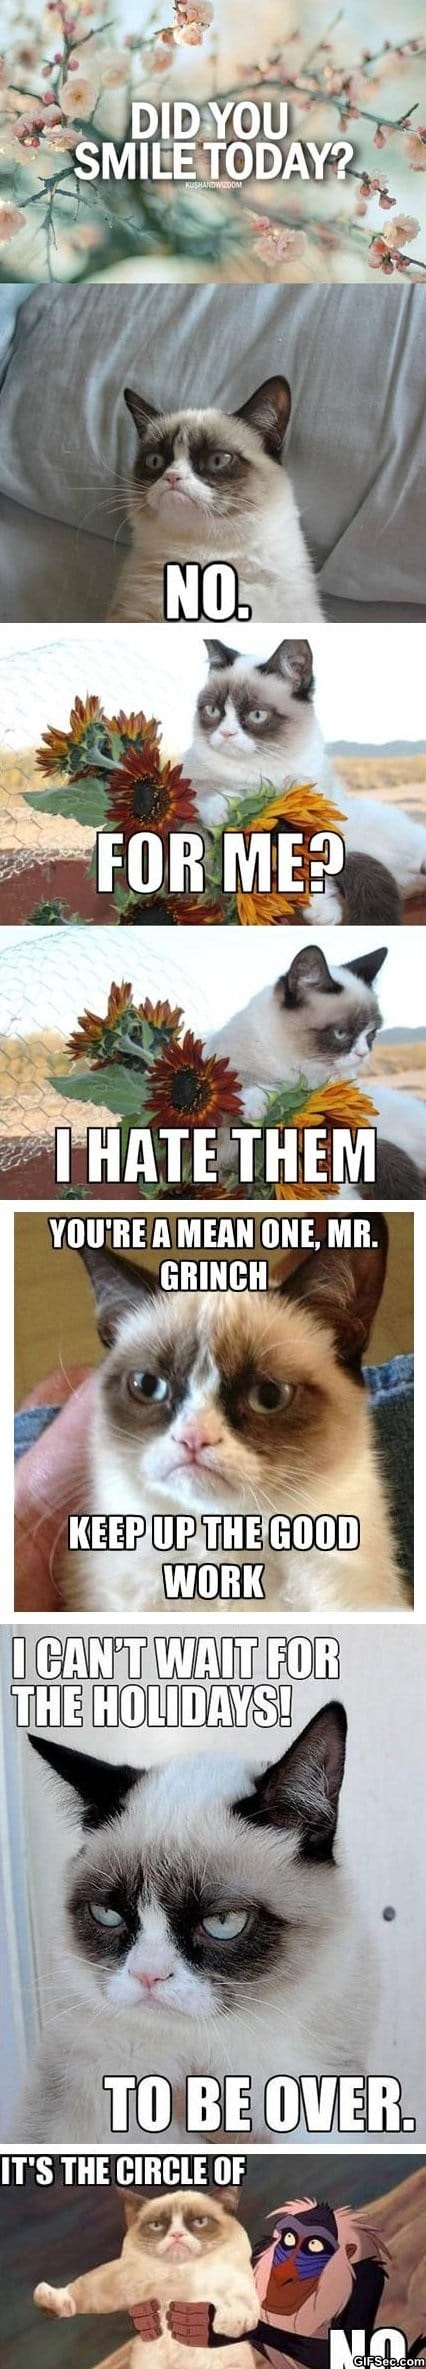 meme-best-of-grumpy-cat